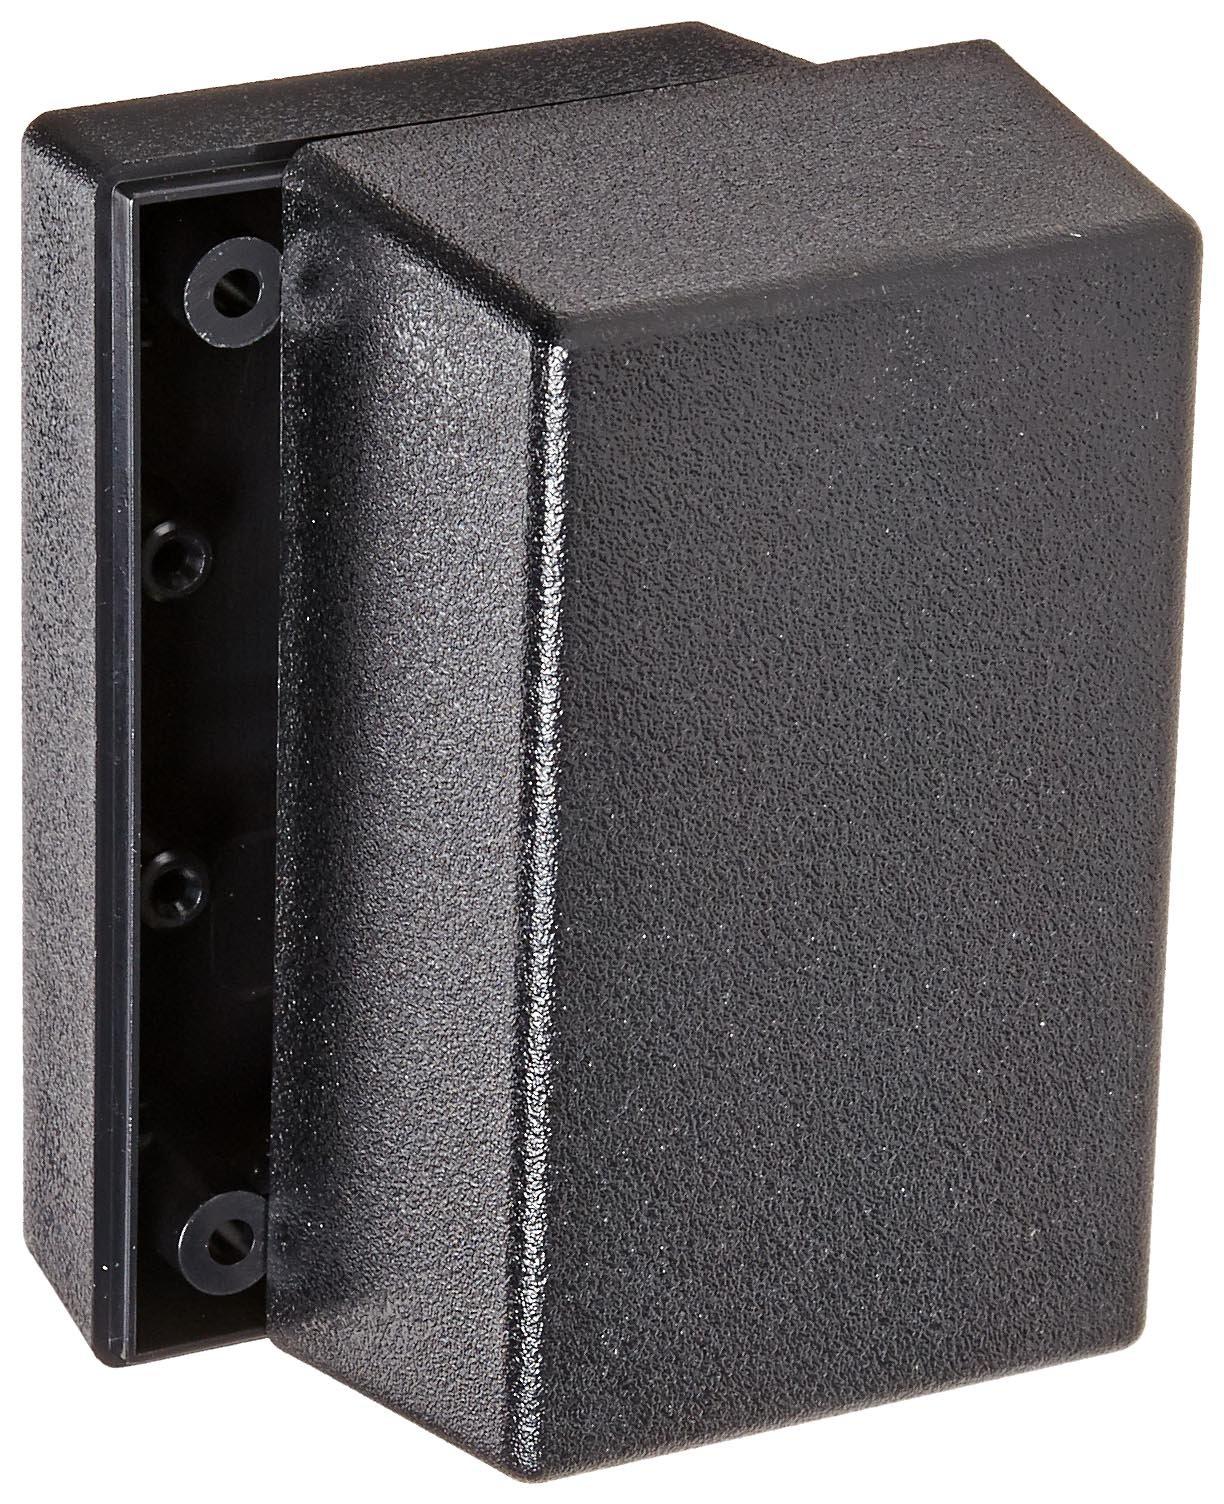 Serpac 112 ABS Plastic Enclosure, 3.6'' Length x 2-1/4'' Width x 2'' Height, Black